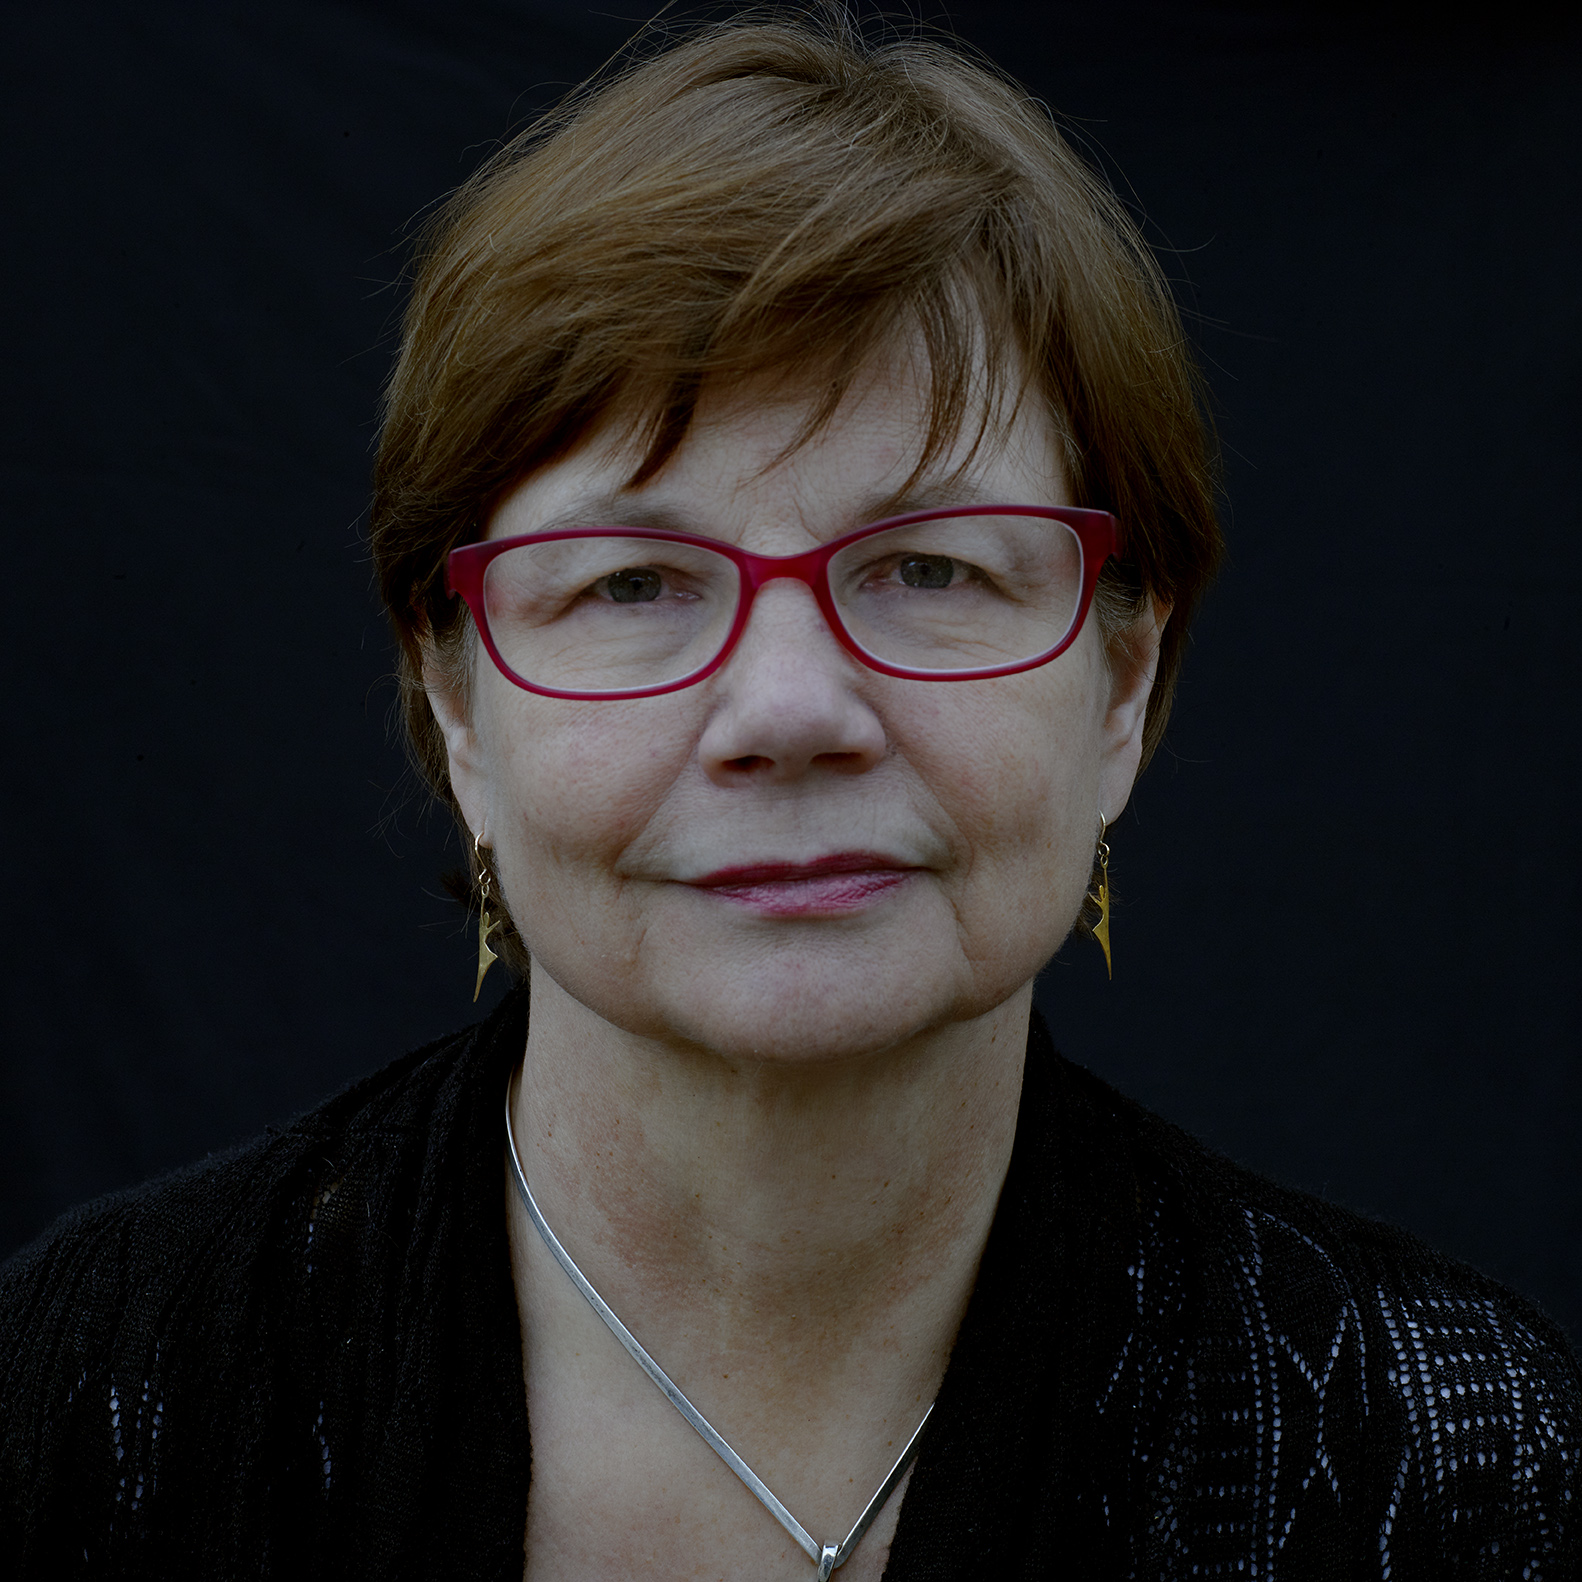 Miriam Silburt